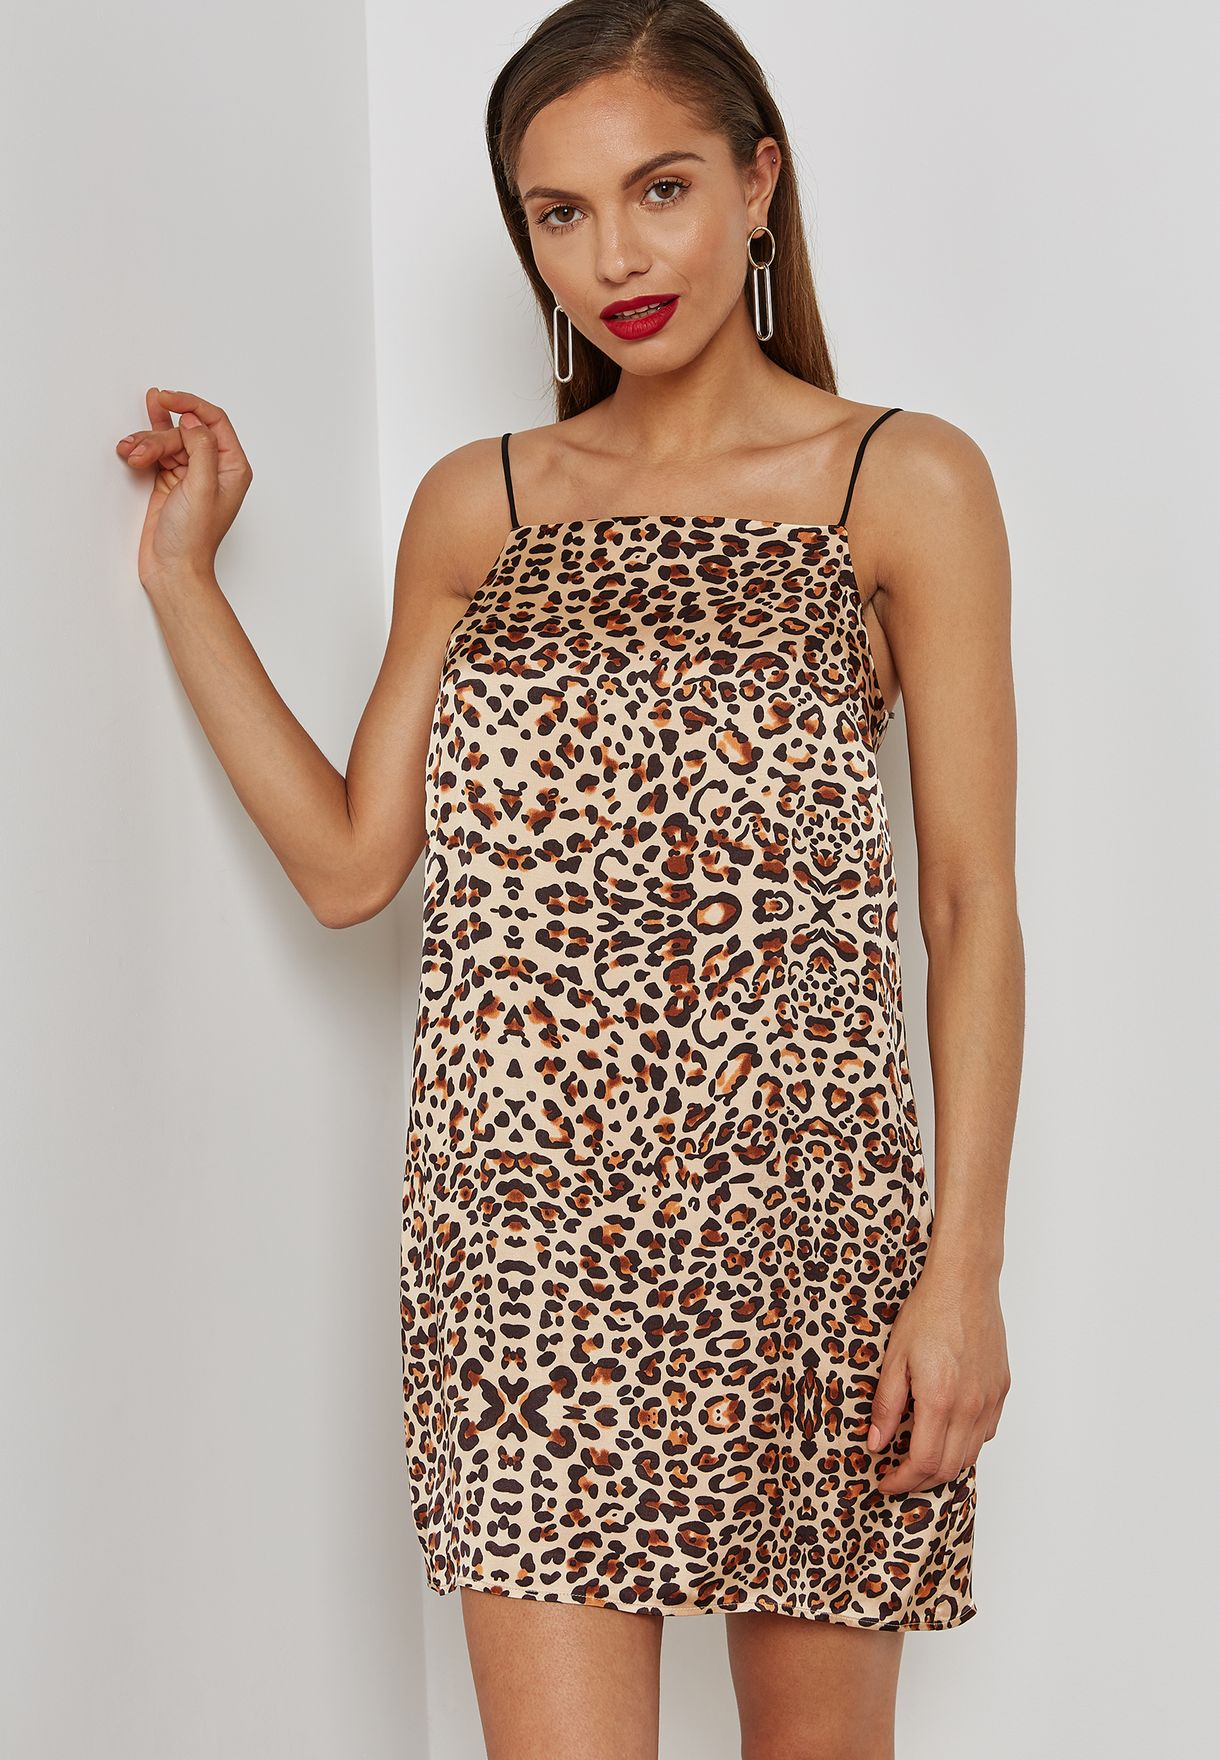 5646a7f29810 Shop Topshop prints Leopard Print Slip Dress 10H10NMUL for Women in ...